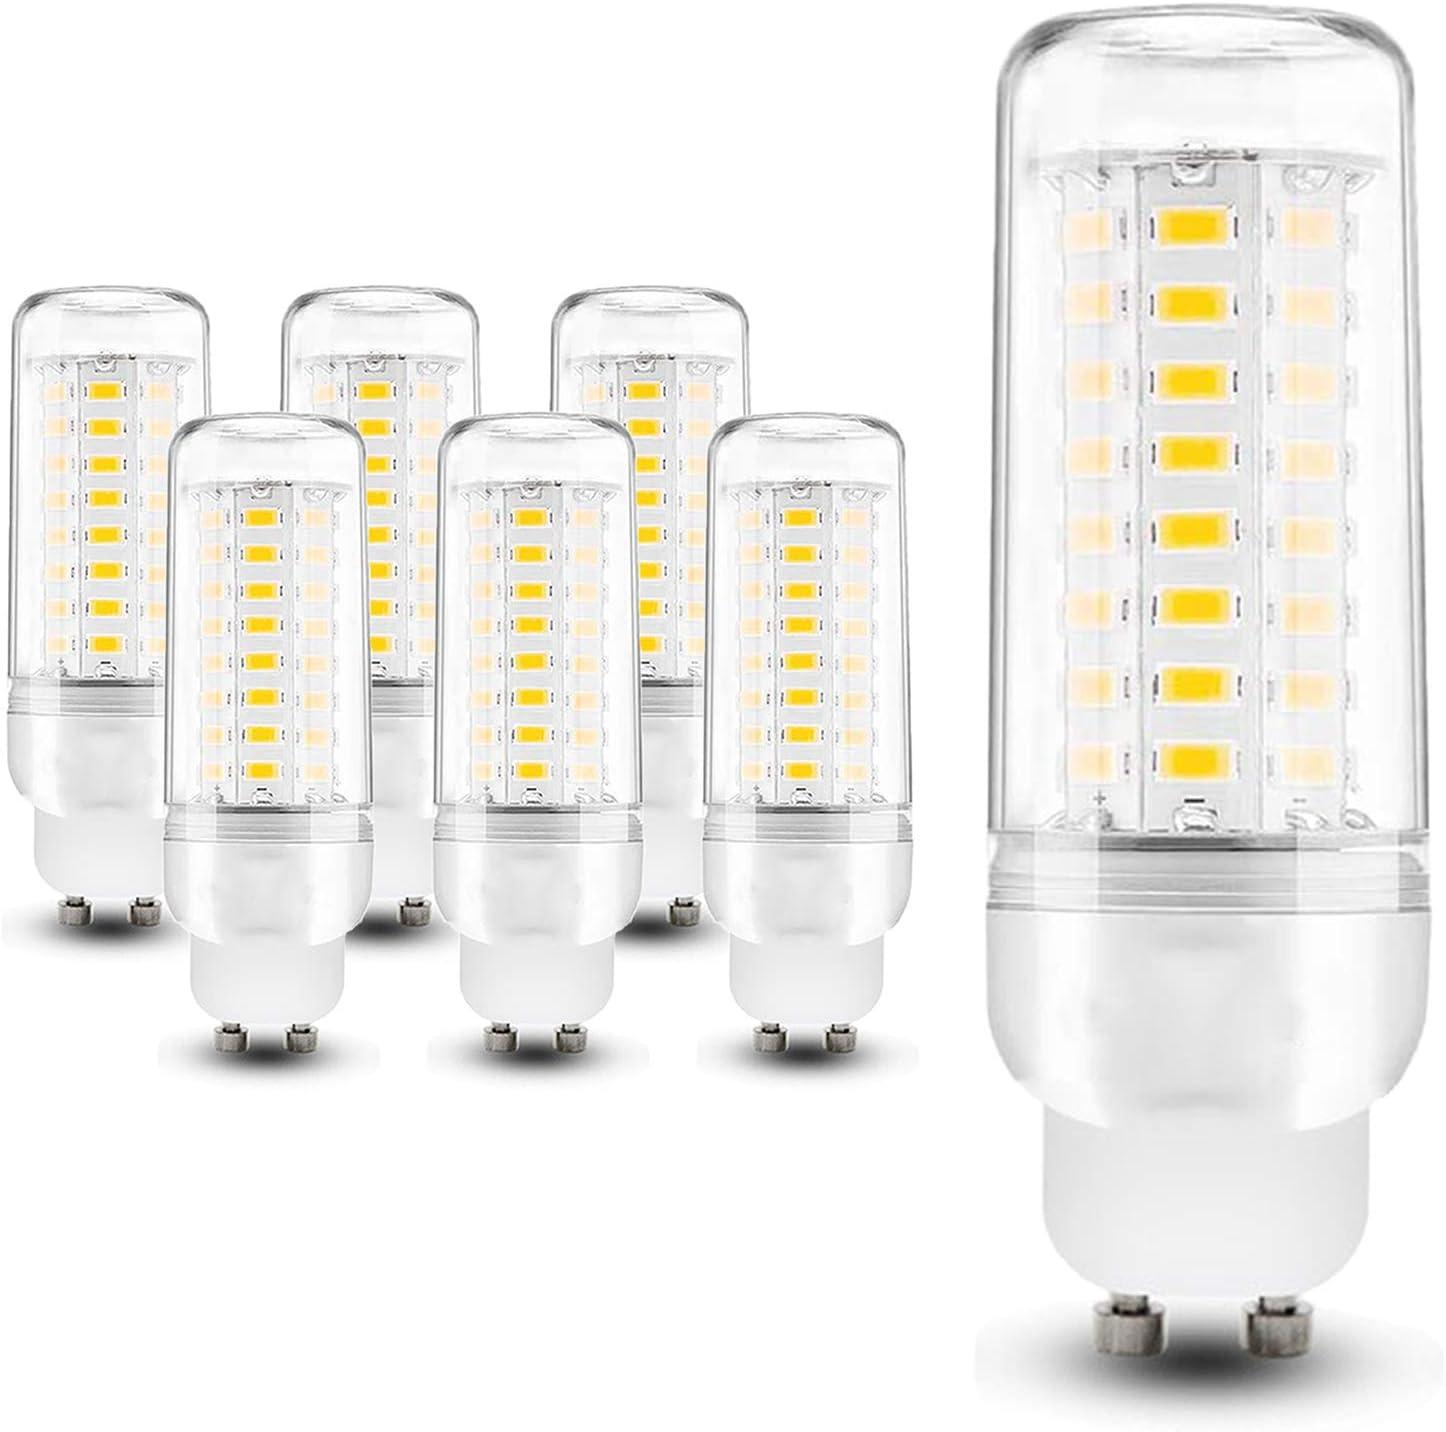 YDHNB GU10 LED Light Bulbs Max 65% OFF 100W 12W Halogen 1200Lm Equivalent 36 Philadelphia Mall